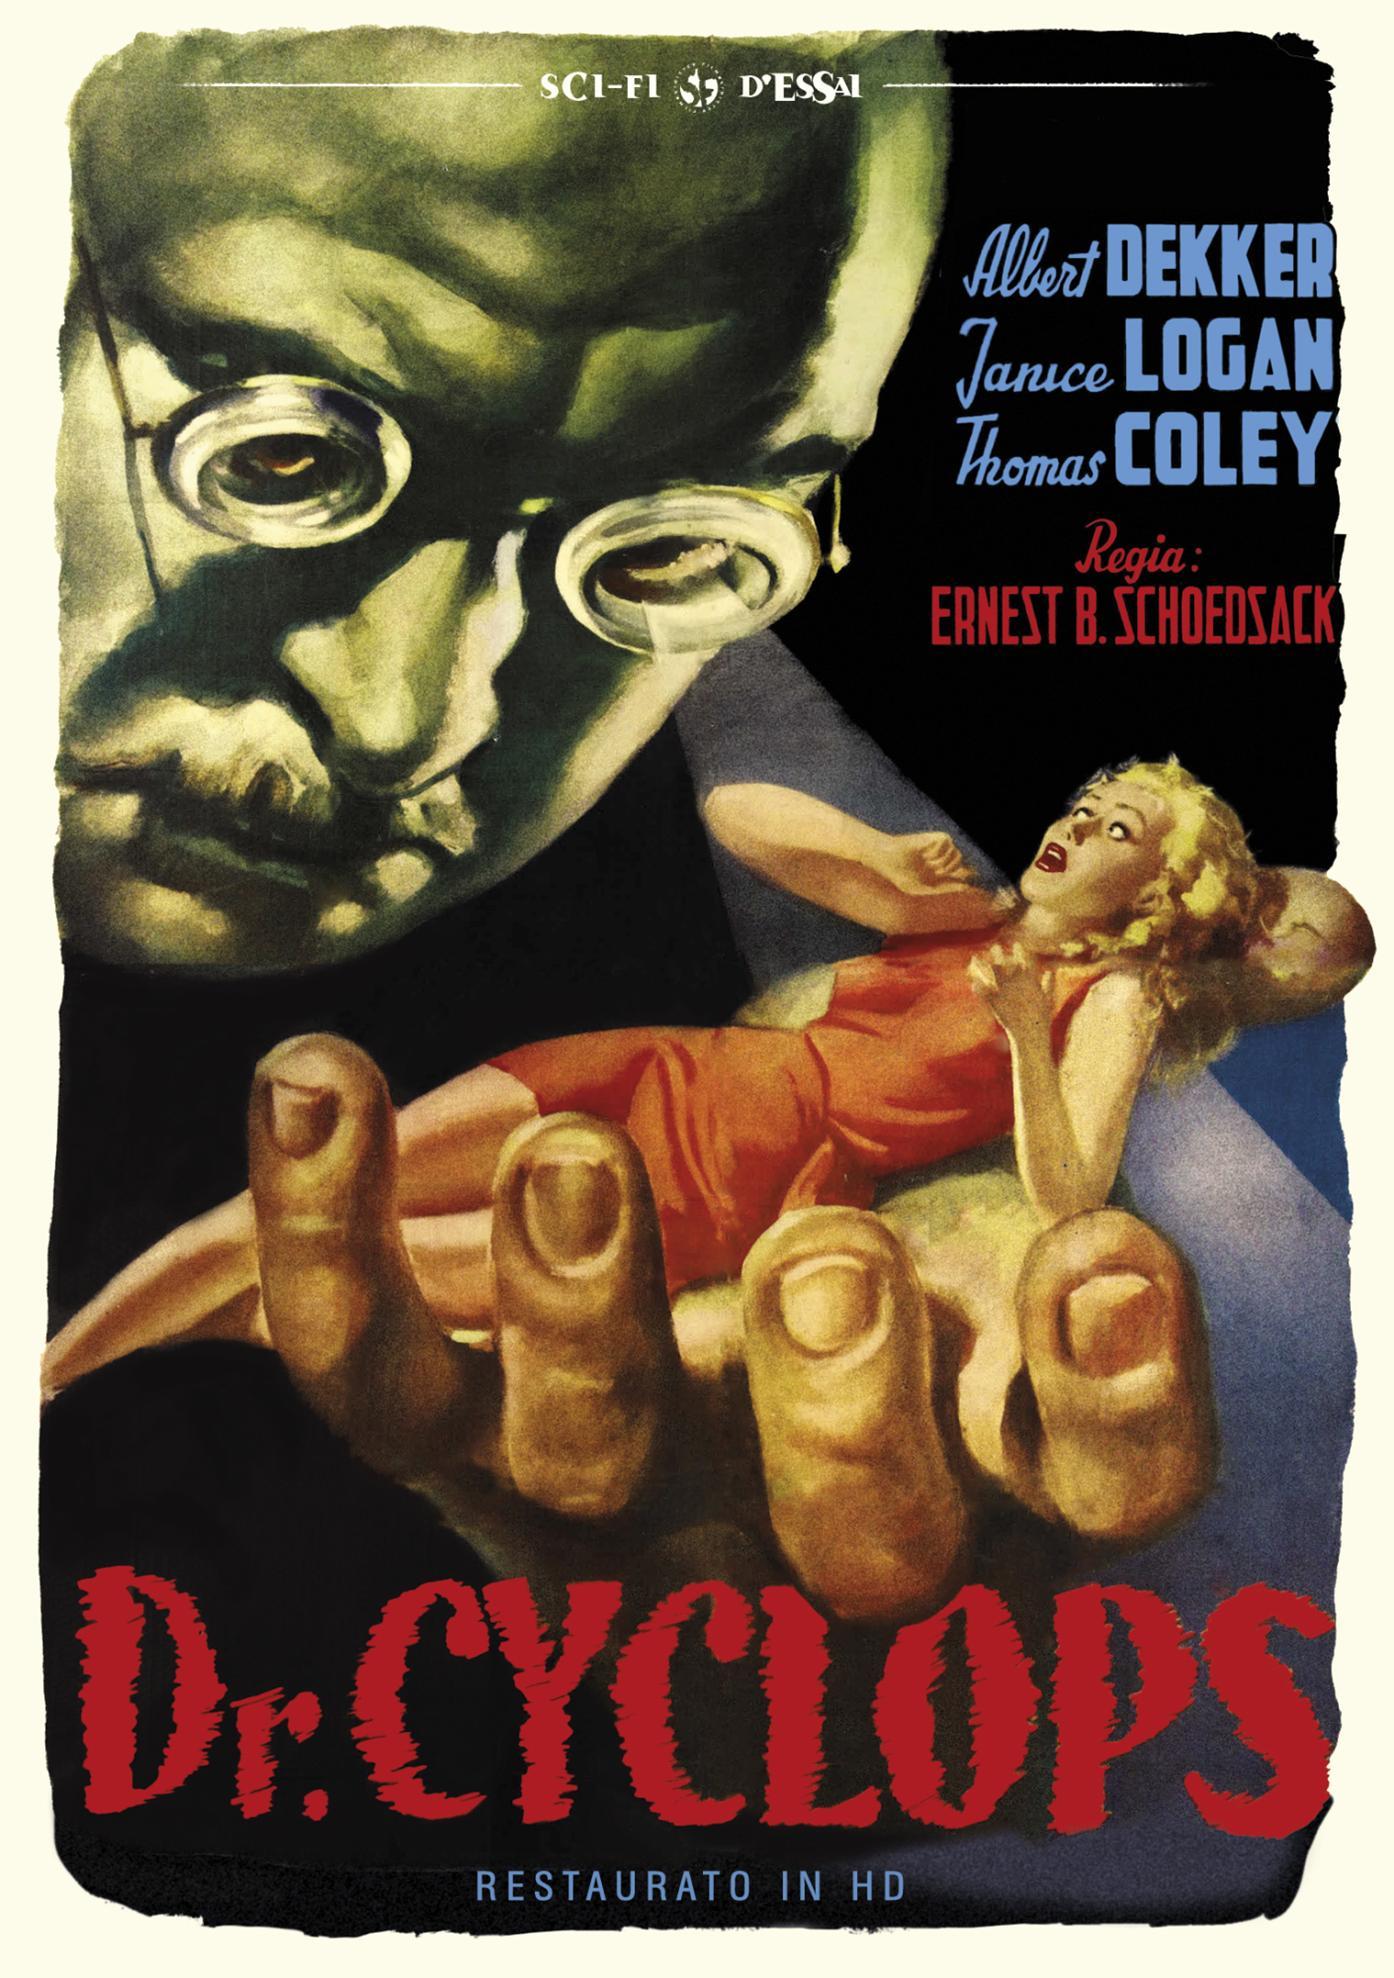 IL DOTTOR CYCLOPS (RESTAURATO IN HD) (DVD)